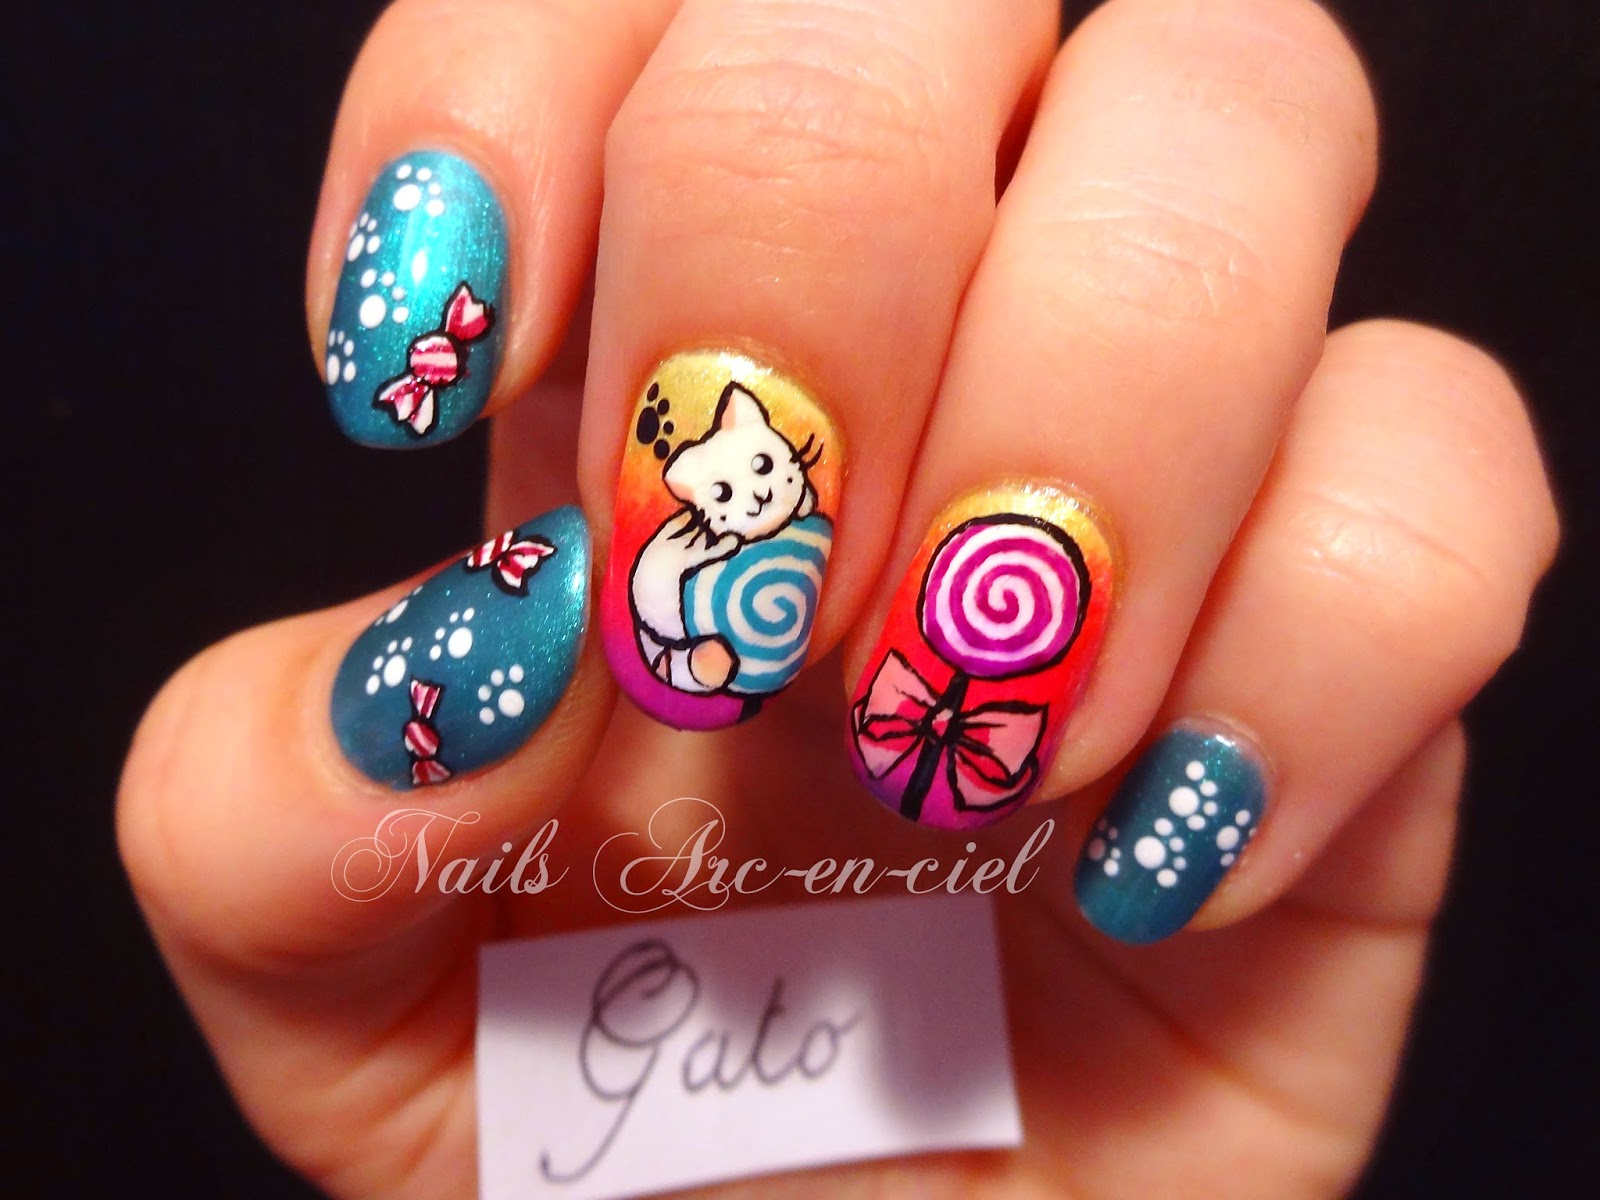 http://nails-arcenciel.blogspot.fr/2014/07/chat-gourmand.html